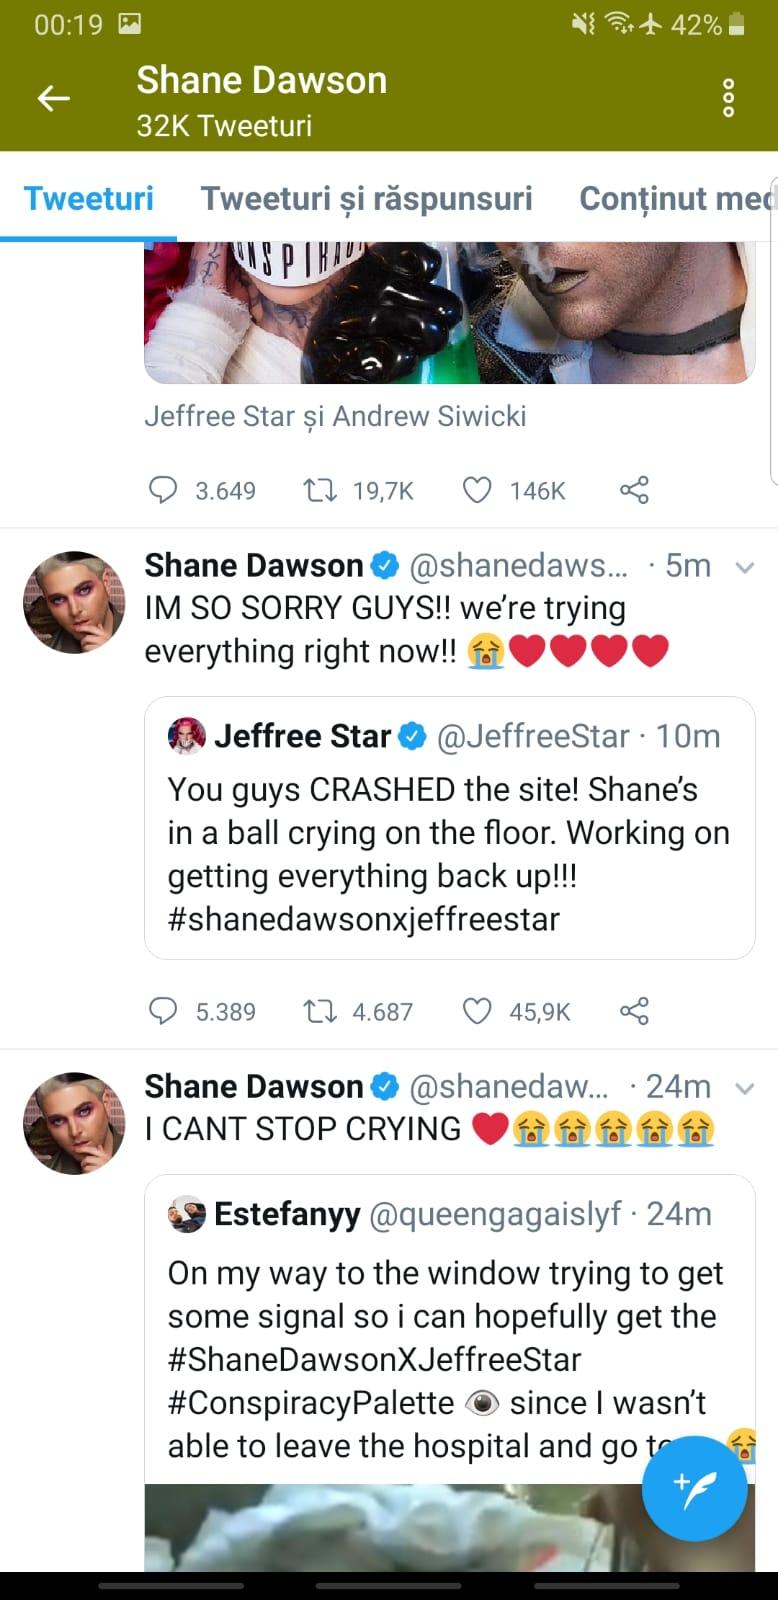 ShaneDawsonXJeffreeStar